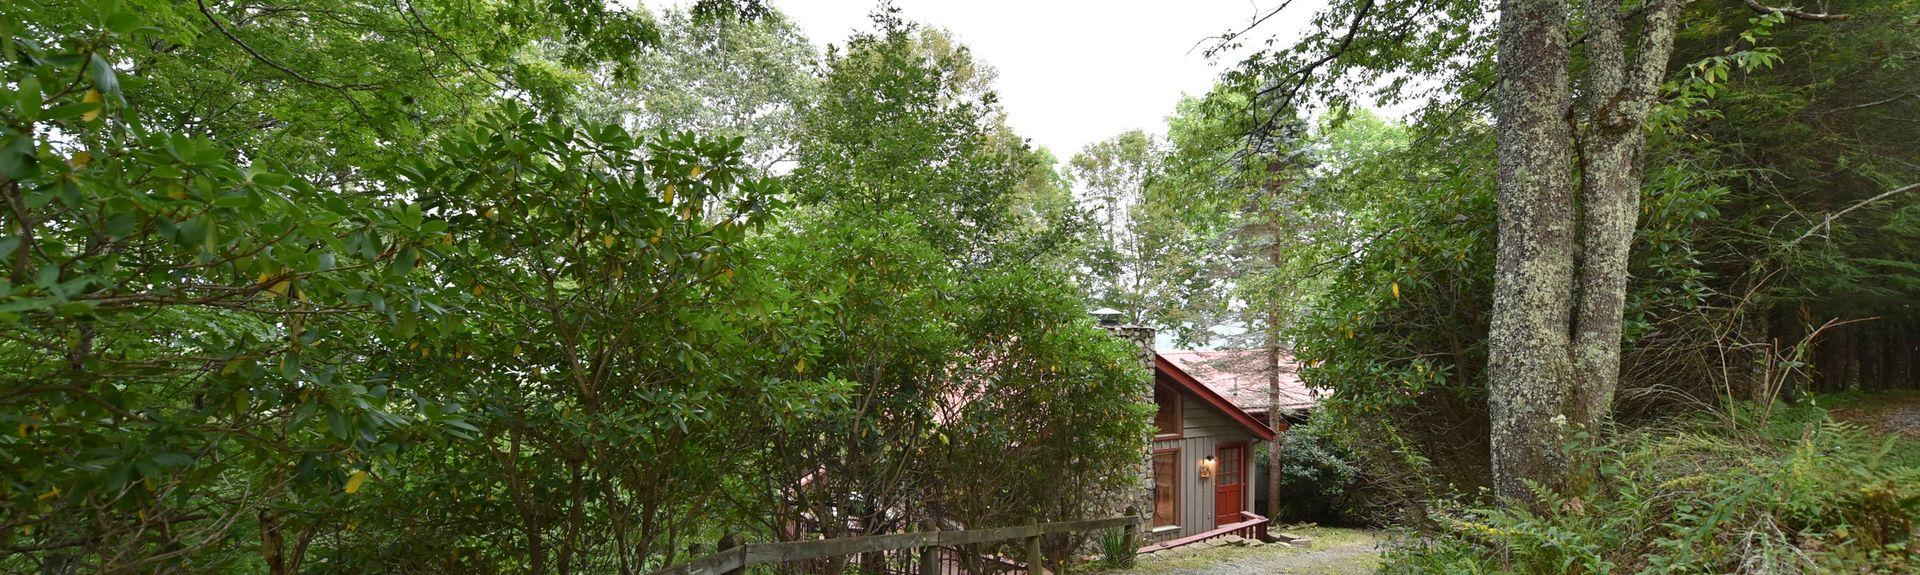 Wolf Laurel, Mars Hill, Carolina do Norte, Estados Unidos